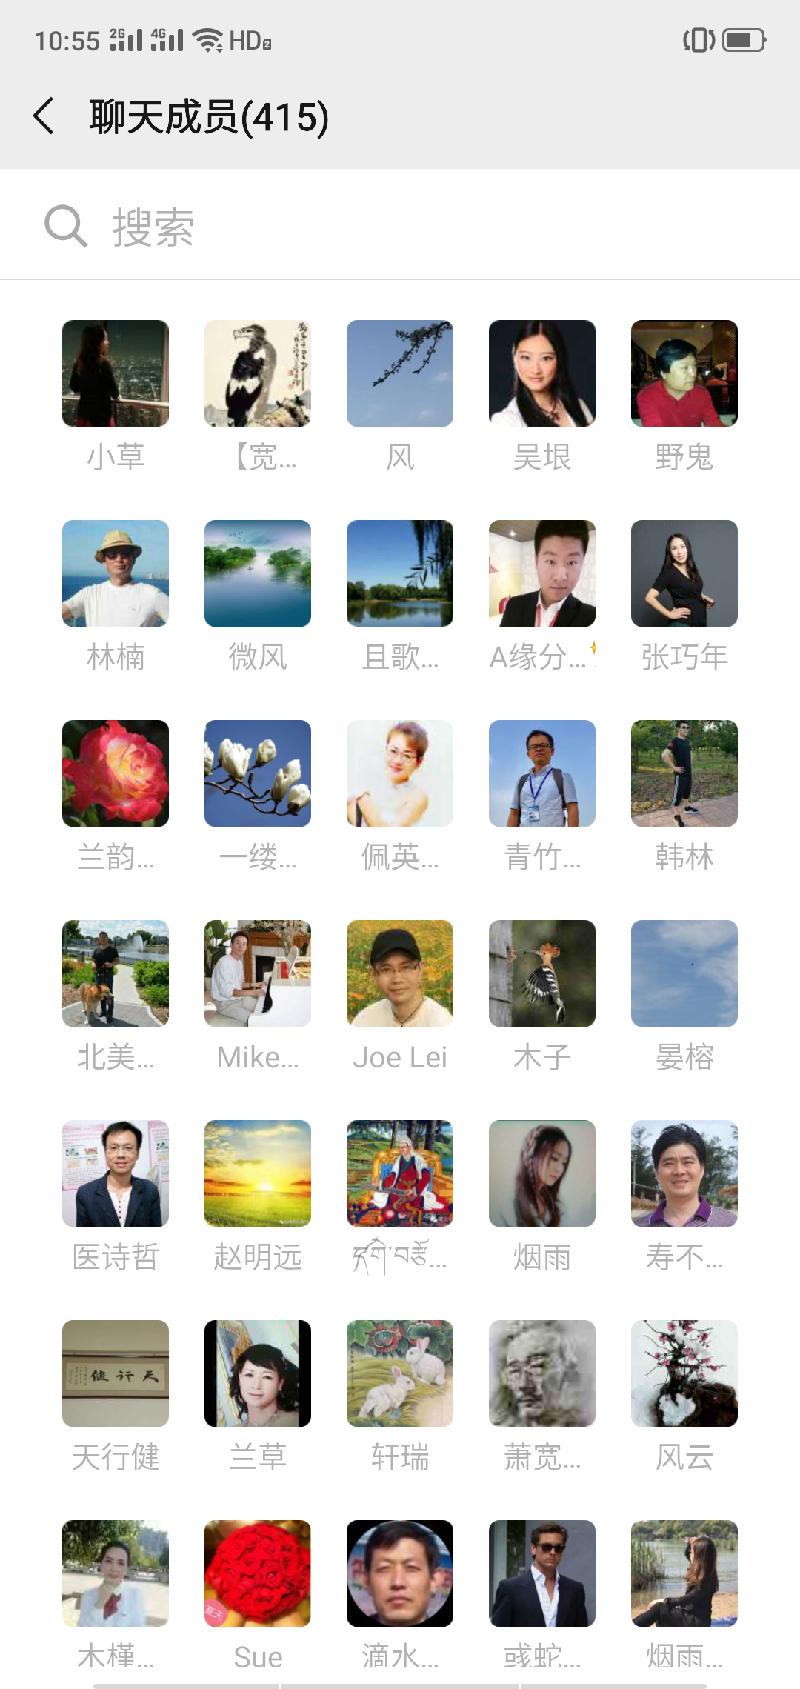 Screenshot_2020-01-15-10-55-28-56